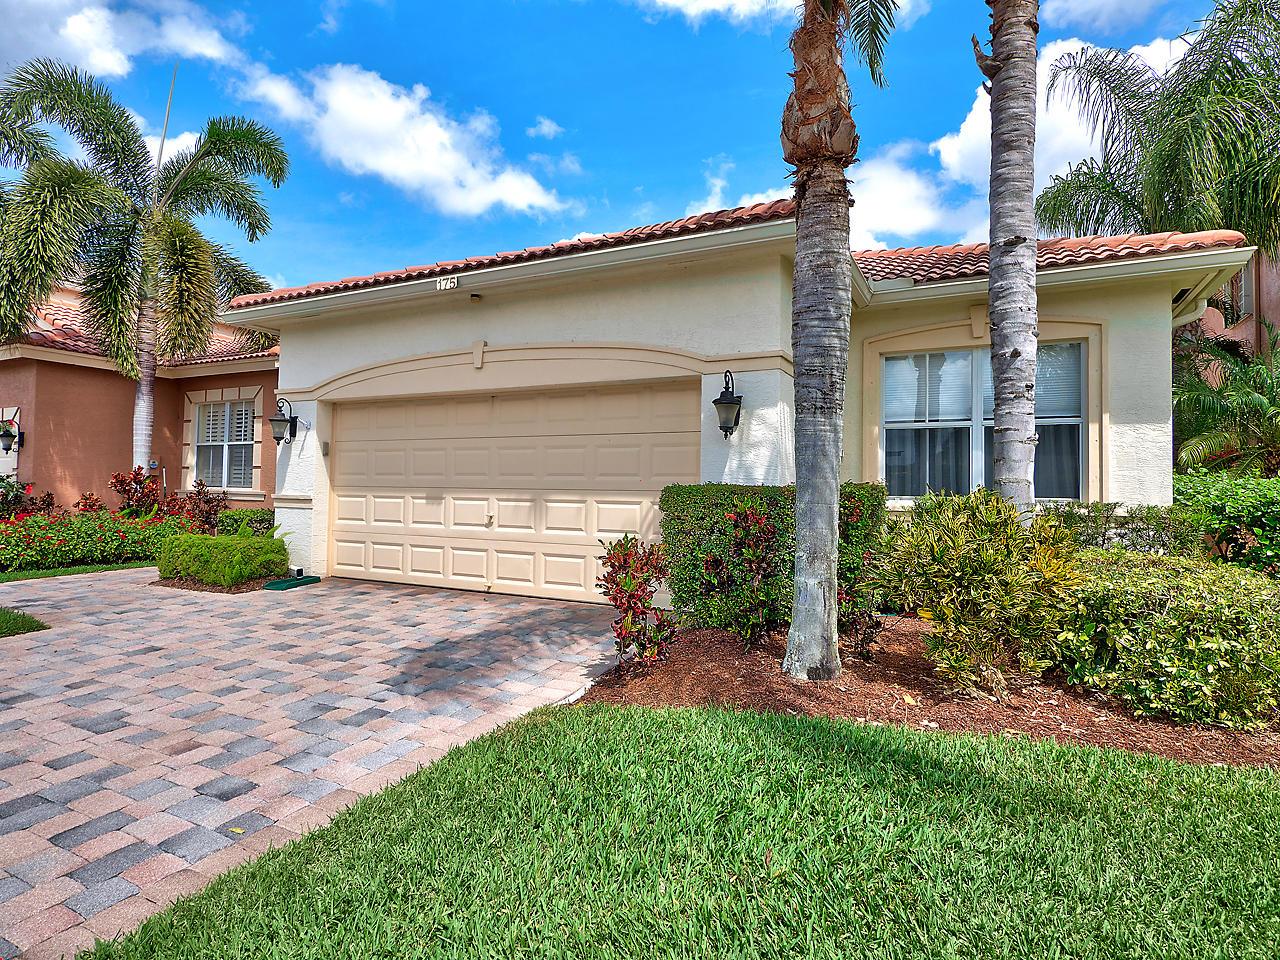 175 Isle Verde Way Palm Beach Gardens,Florida 33418,3 Bedrooms Bedrooms,2 BathroomsBathrooms,A,Isle Verde,RX-10469683